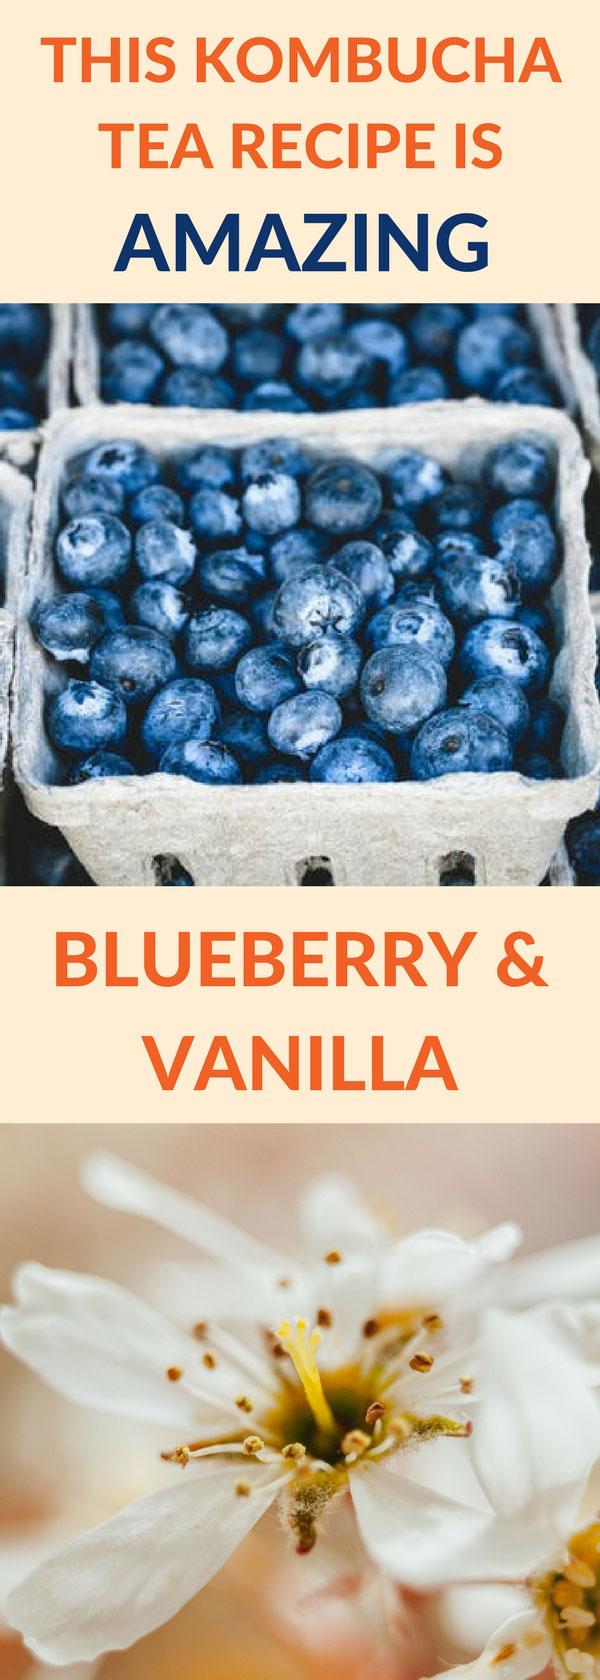 flavor kombucha blueberry vanilla pin